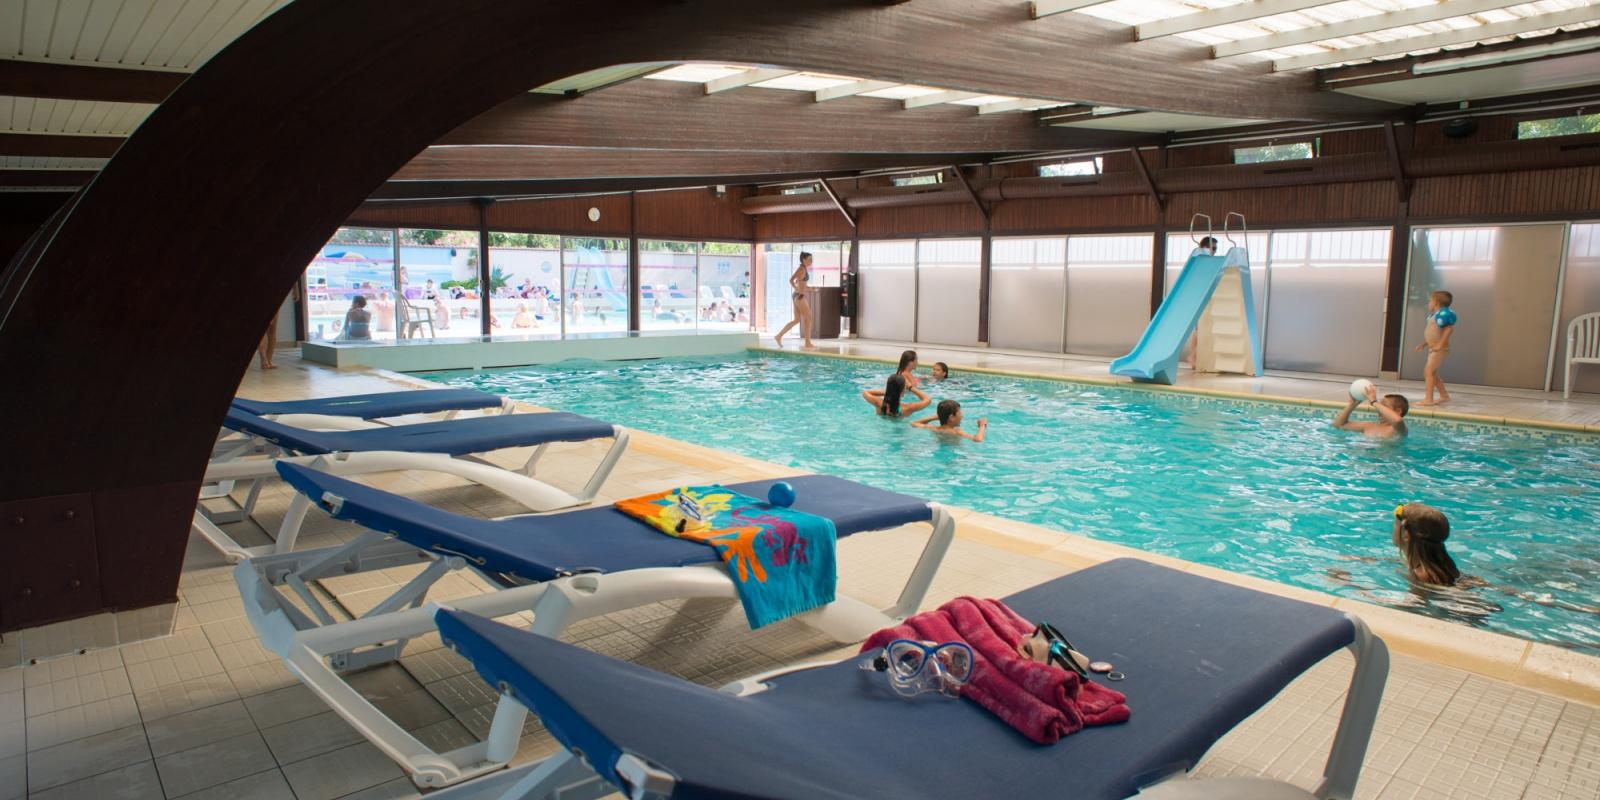 Piscine d 39 t piscine couverte camping au grau du roi - Camping albertville avec piscine ...